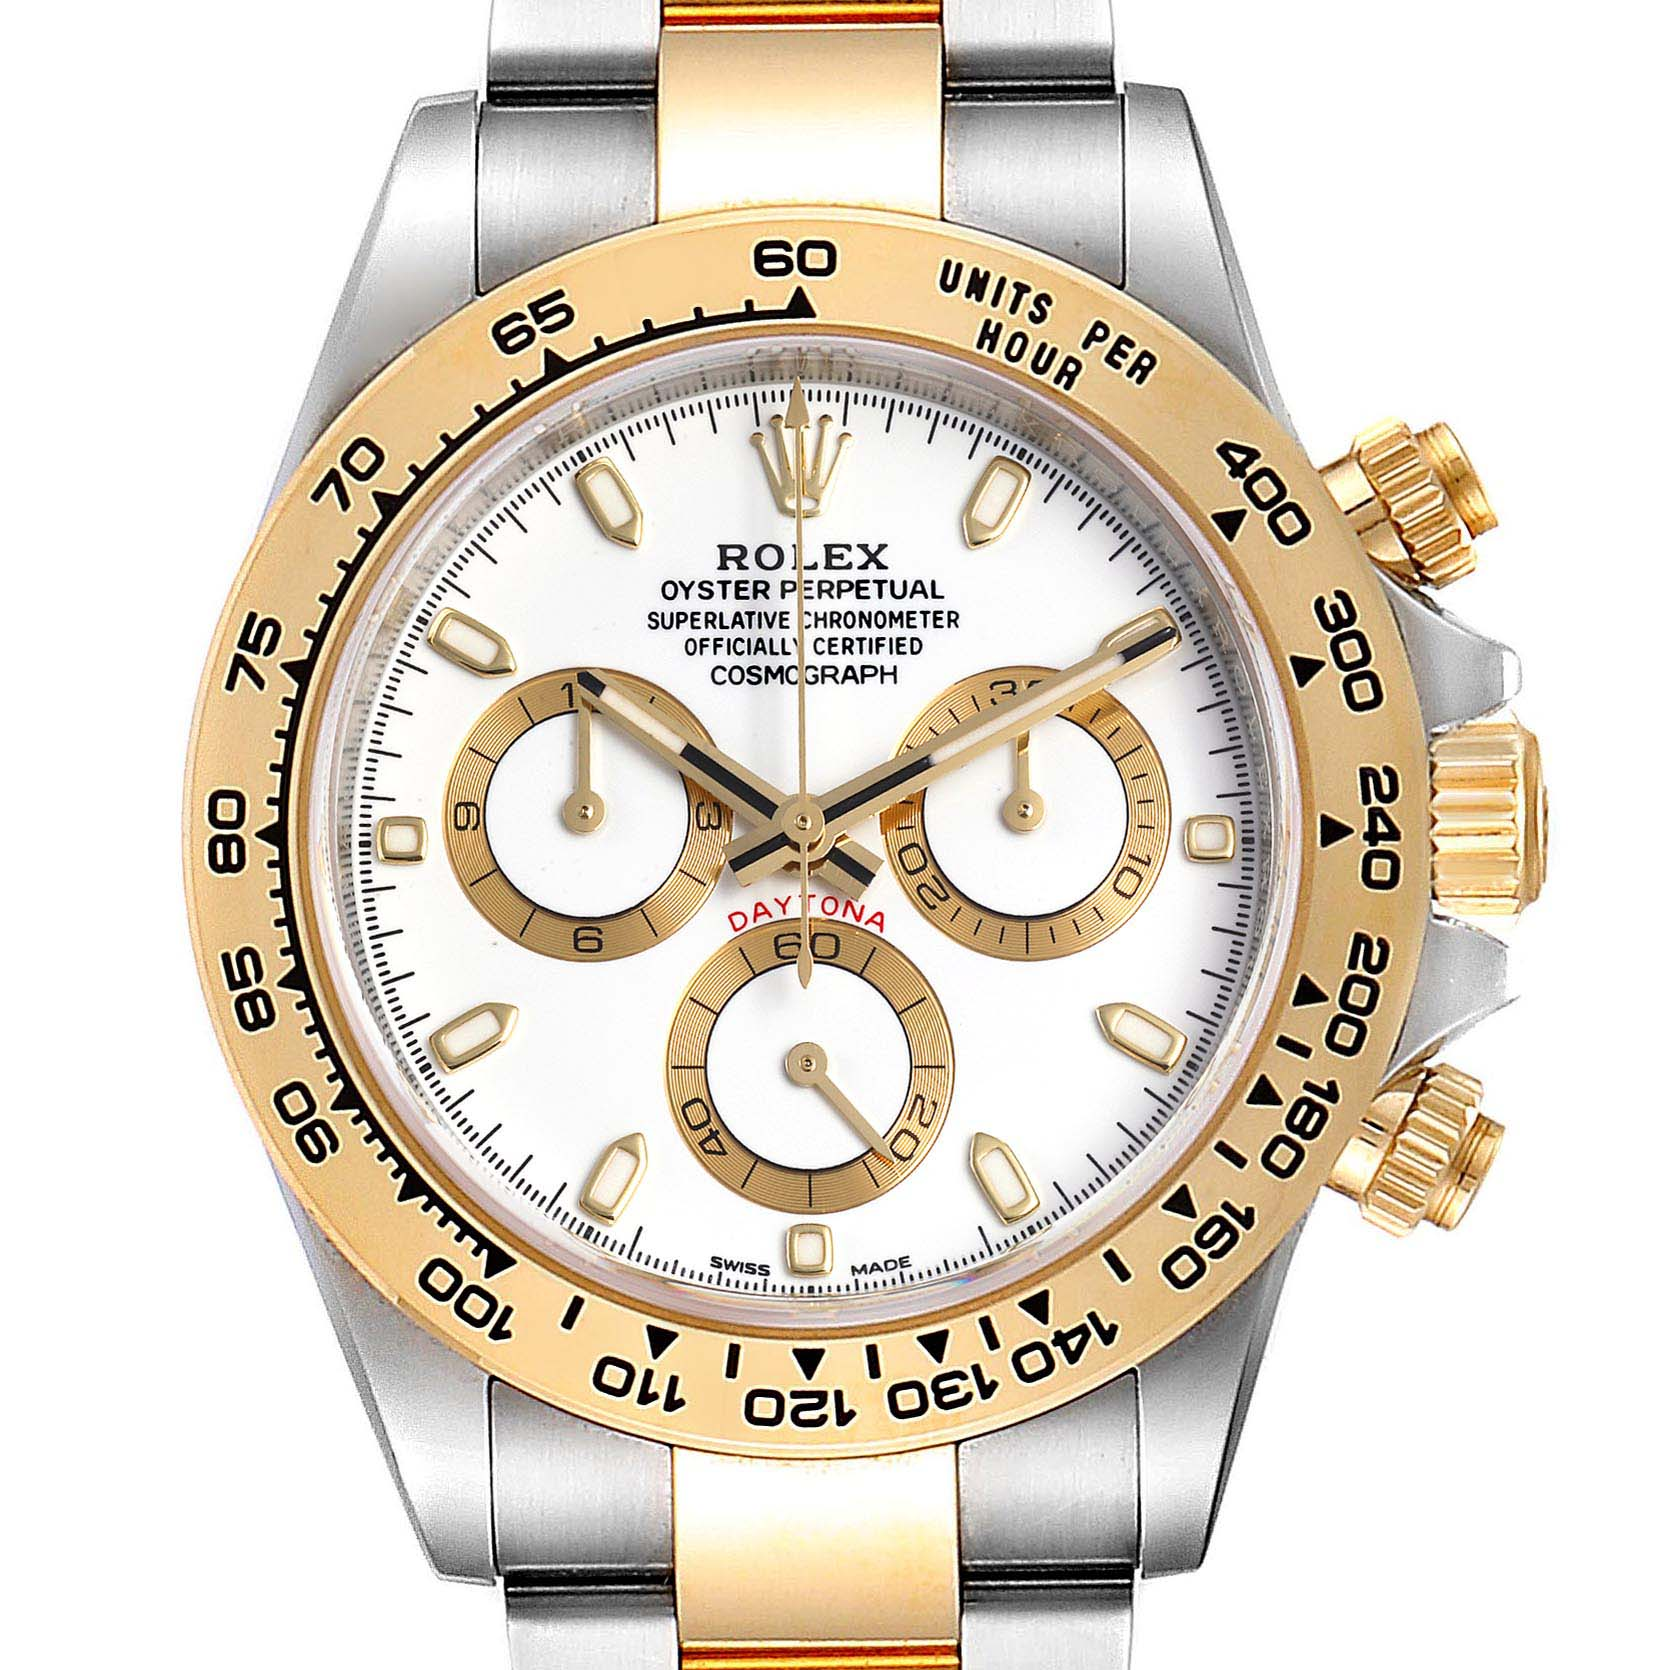 Rolex Cosmograph Daytona White Dial Steel Yellow Gold Mens Watch 116503